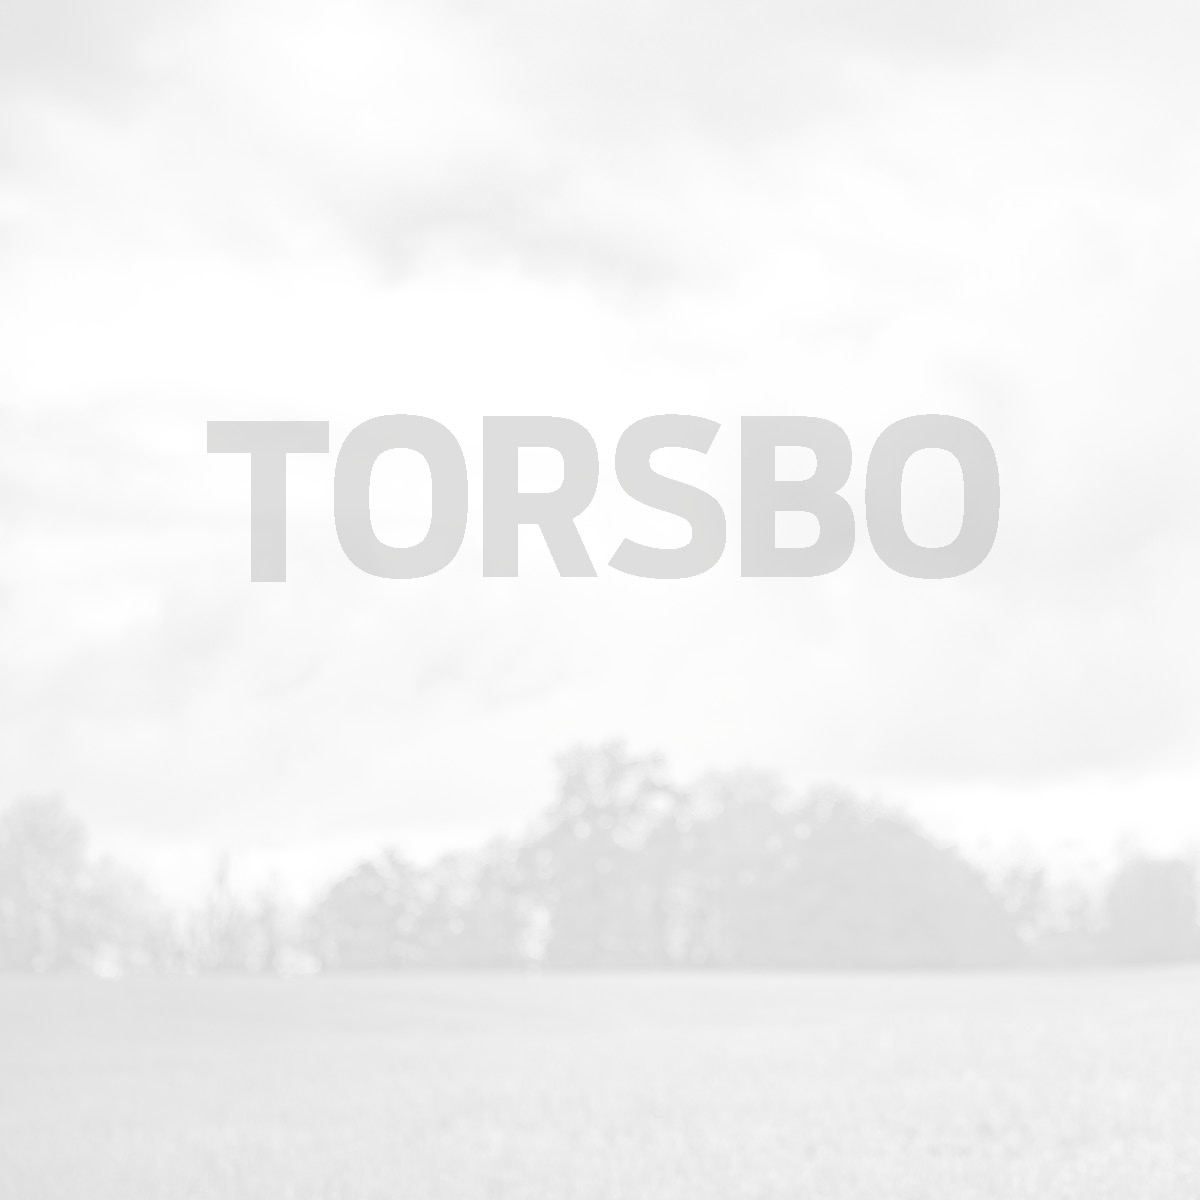 Barnes 7mm Rem Mag TTSX BT Vor-Tx